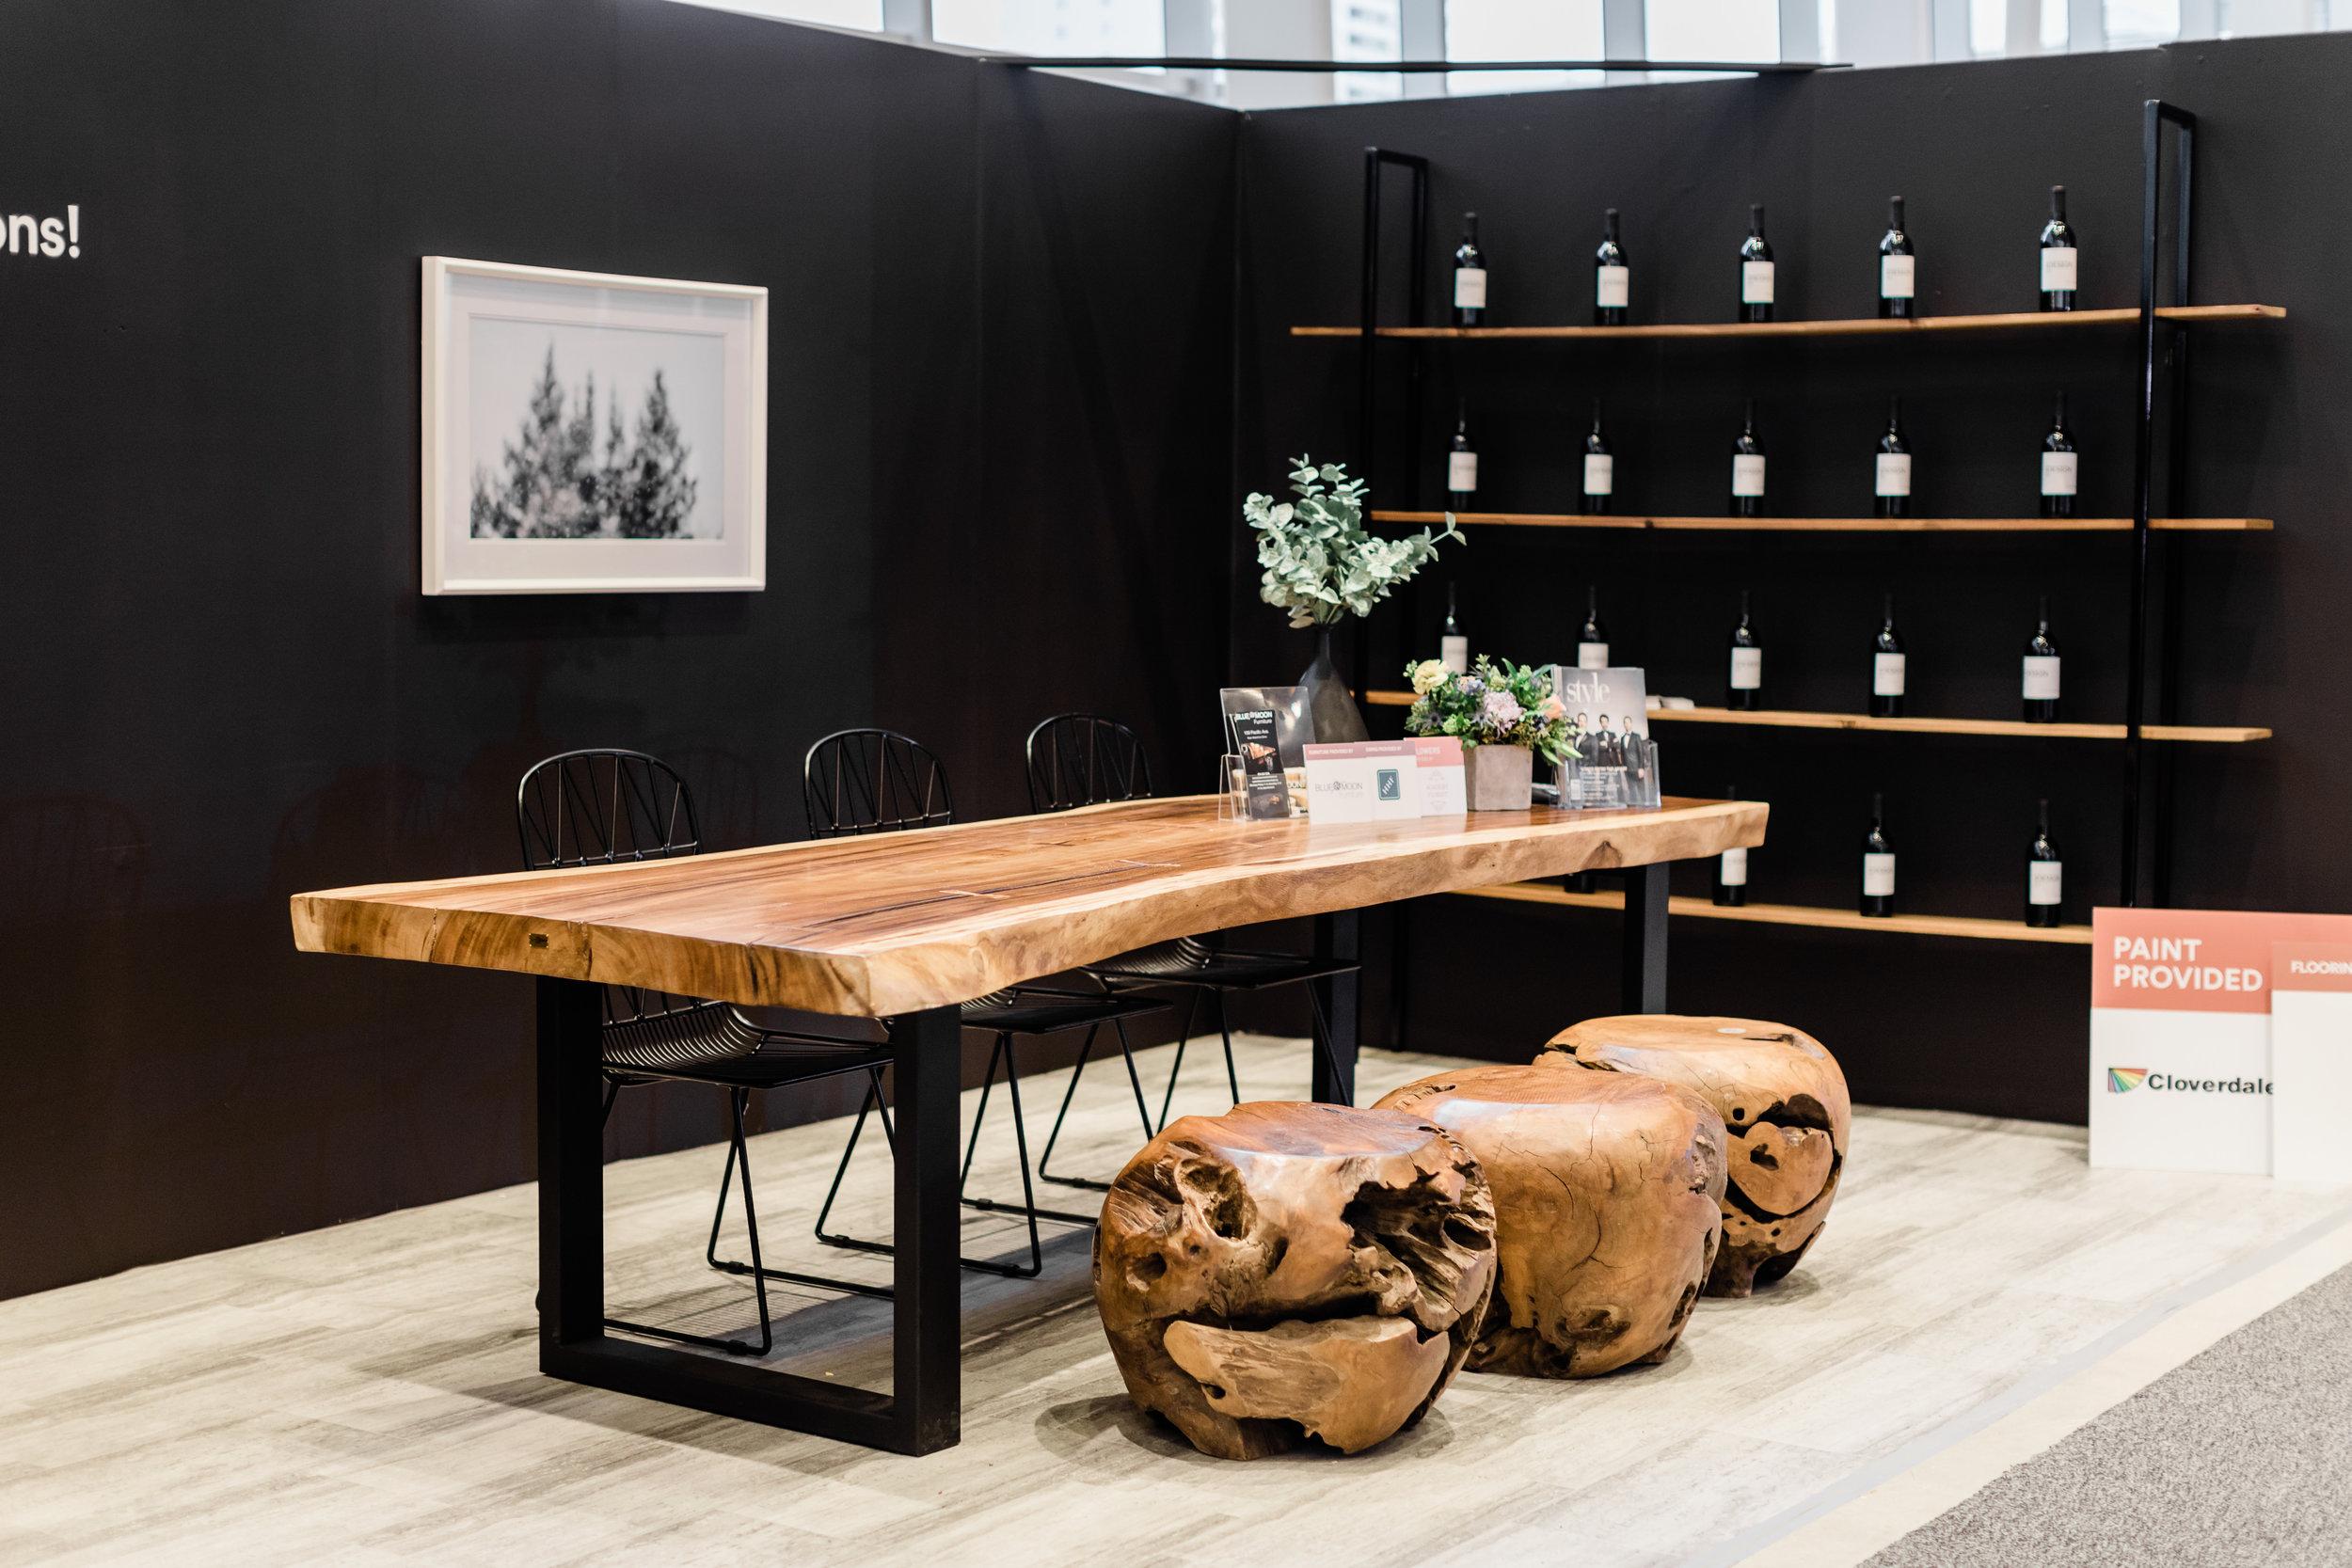 Copy of Majestic Live Edge, Single Slab Dining Table. Blue Moon Furniture store in Winnipeg